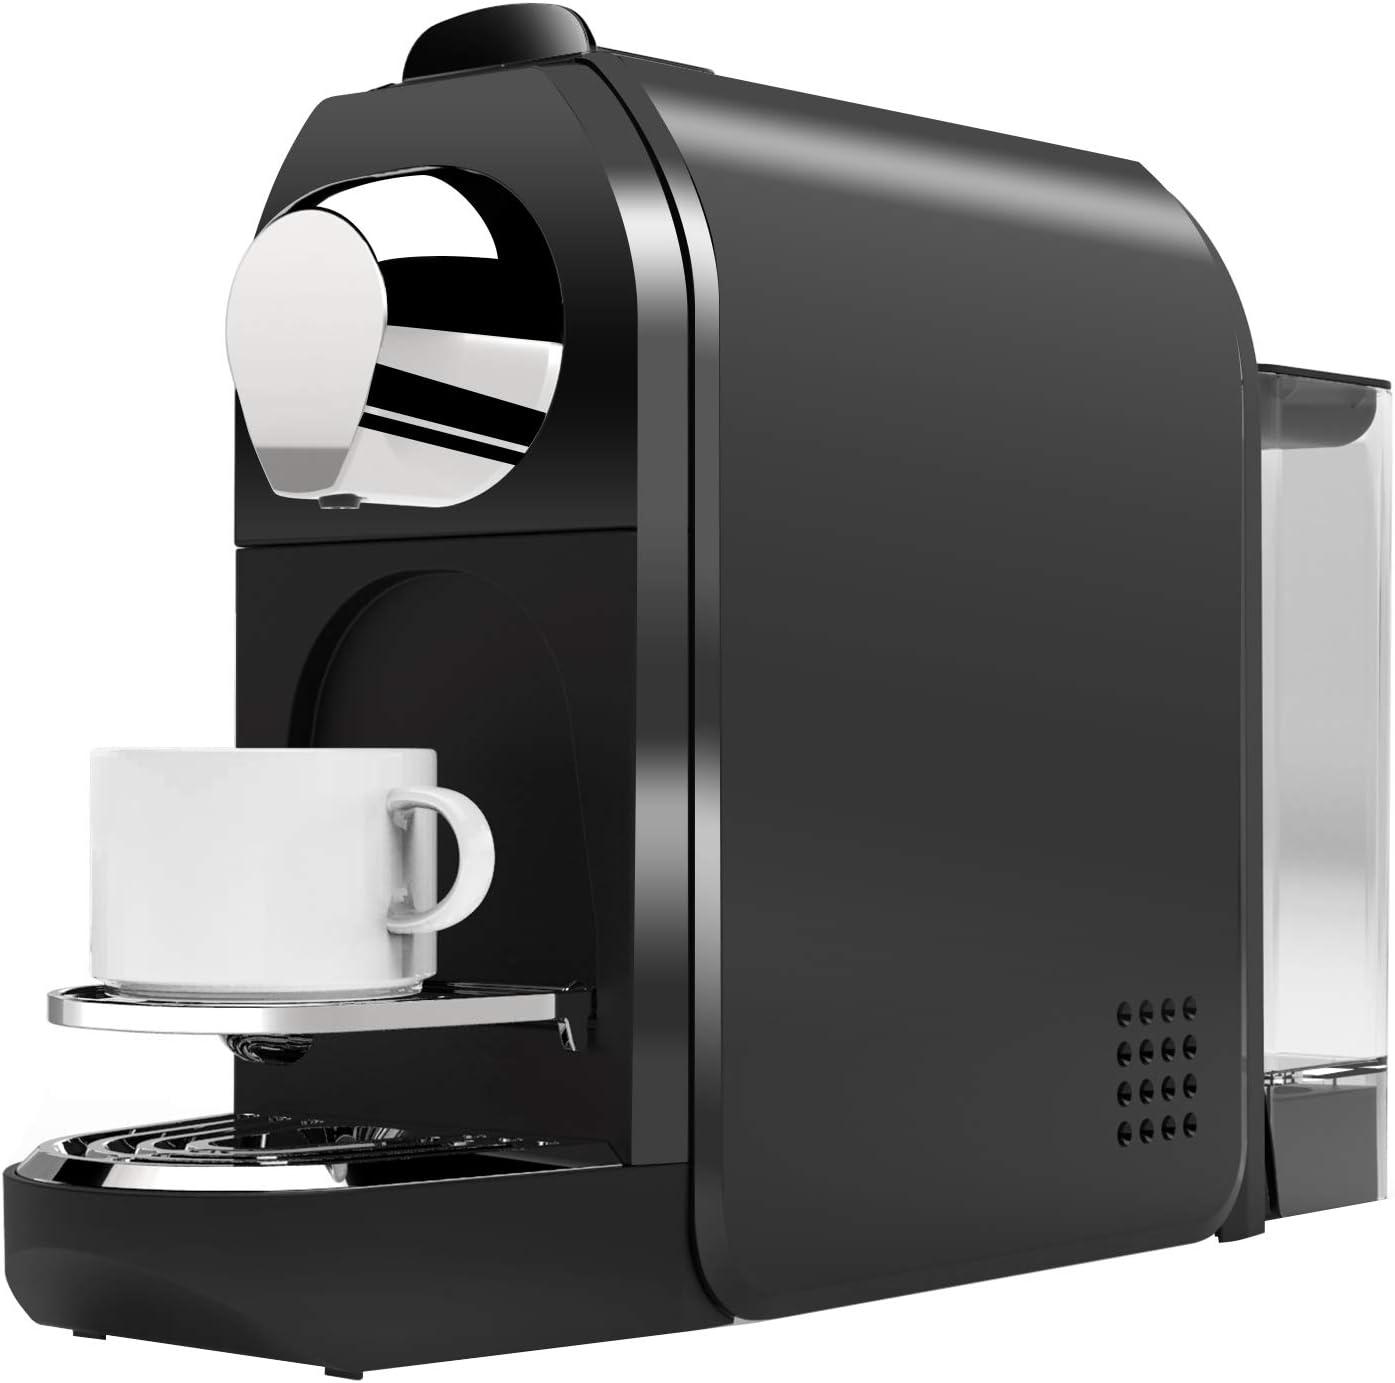 Grenp Grenp-02 Adjustable, Double, Black